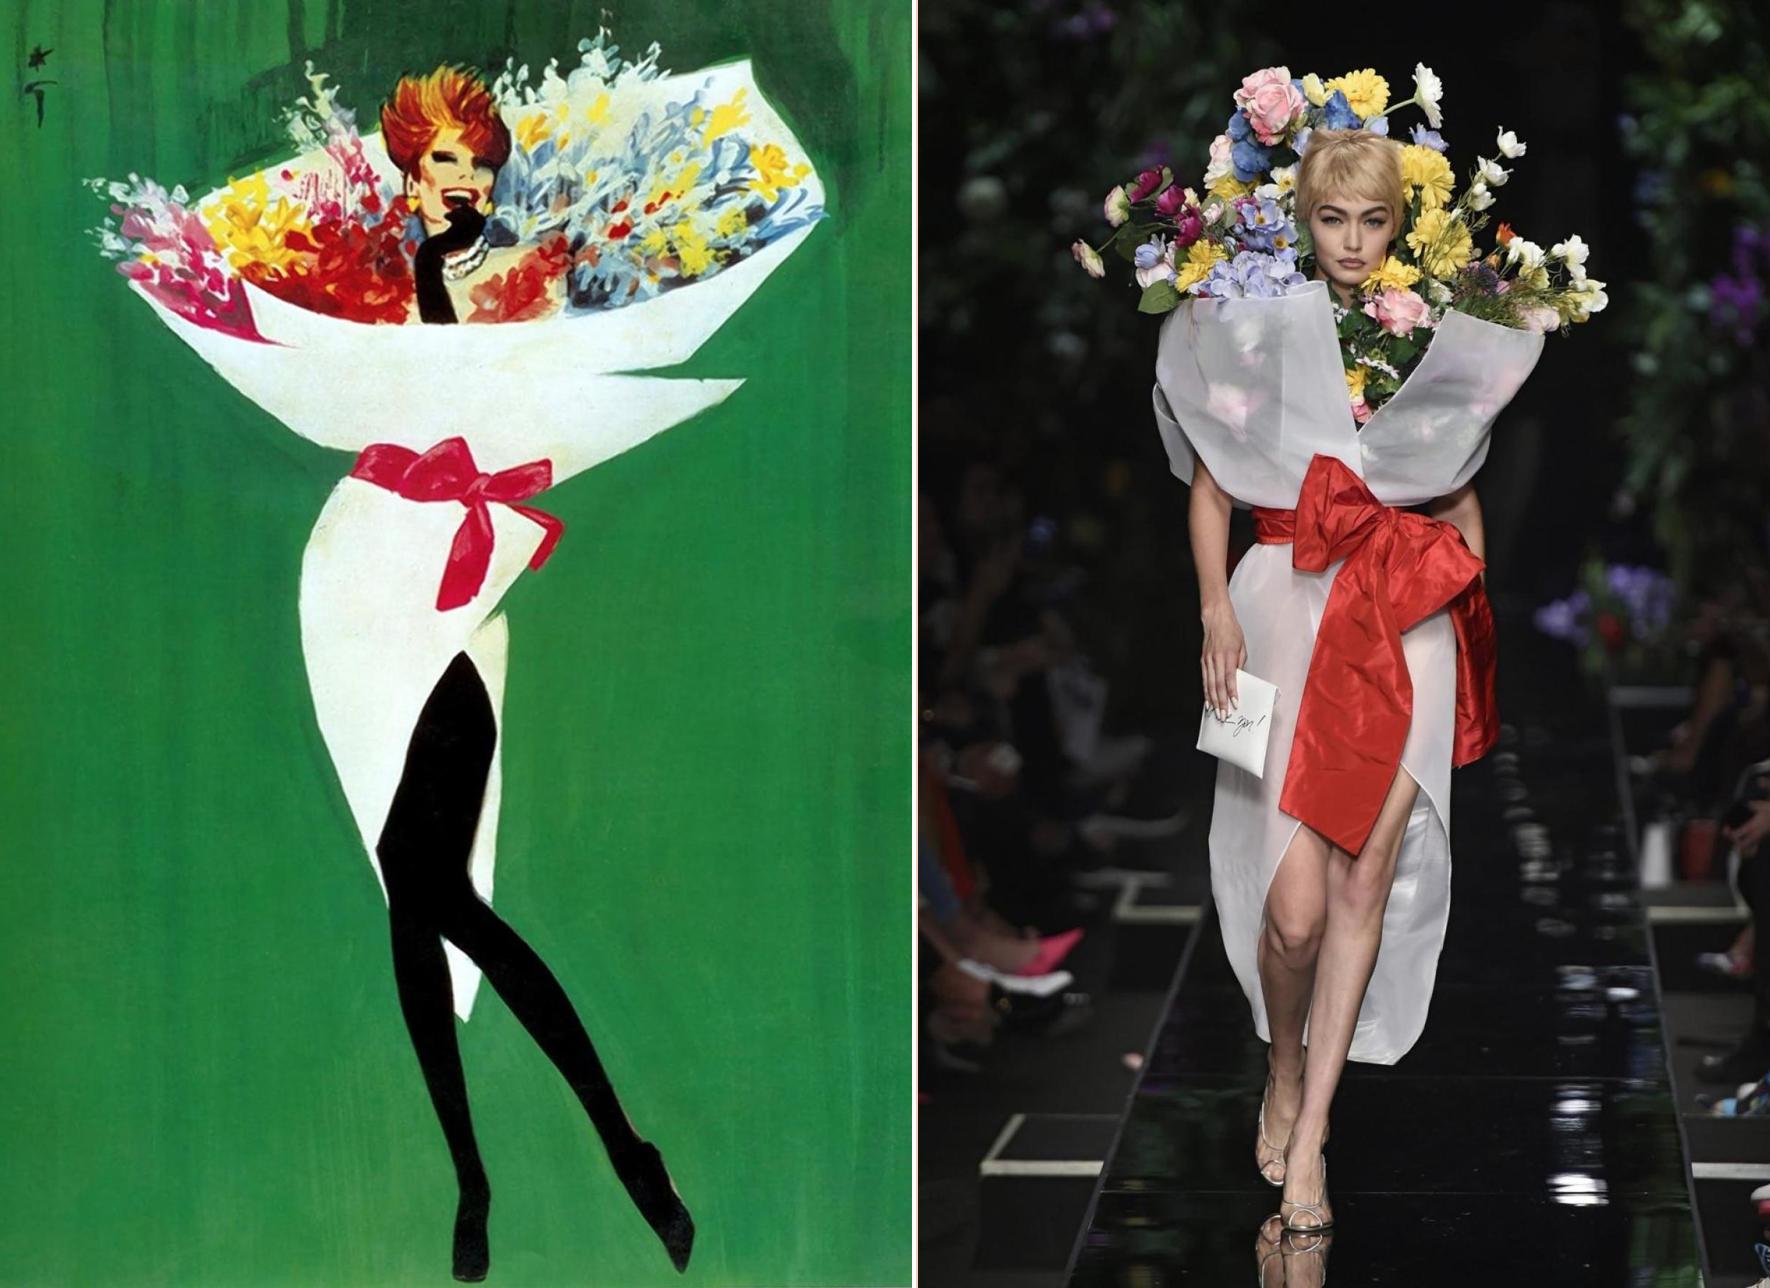 Rene Gruau's illustration (left) & Jeremy Scott's S/S 2018 Moschino (right)